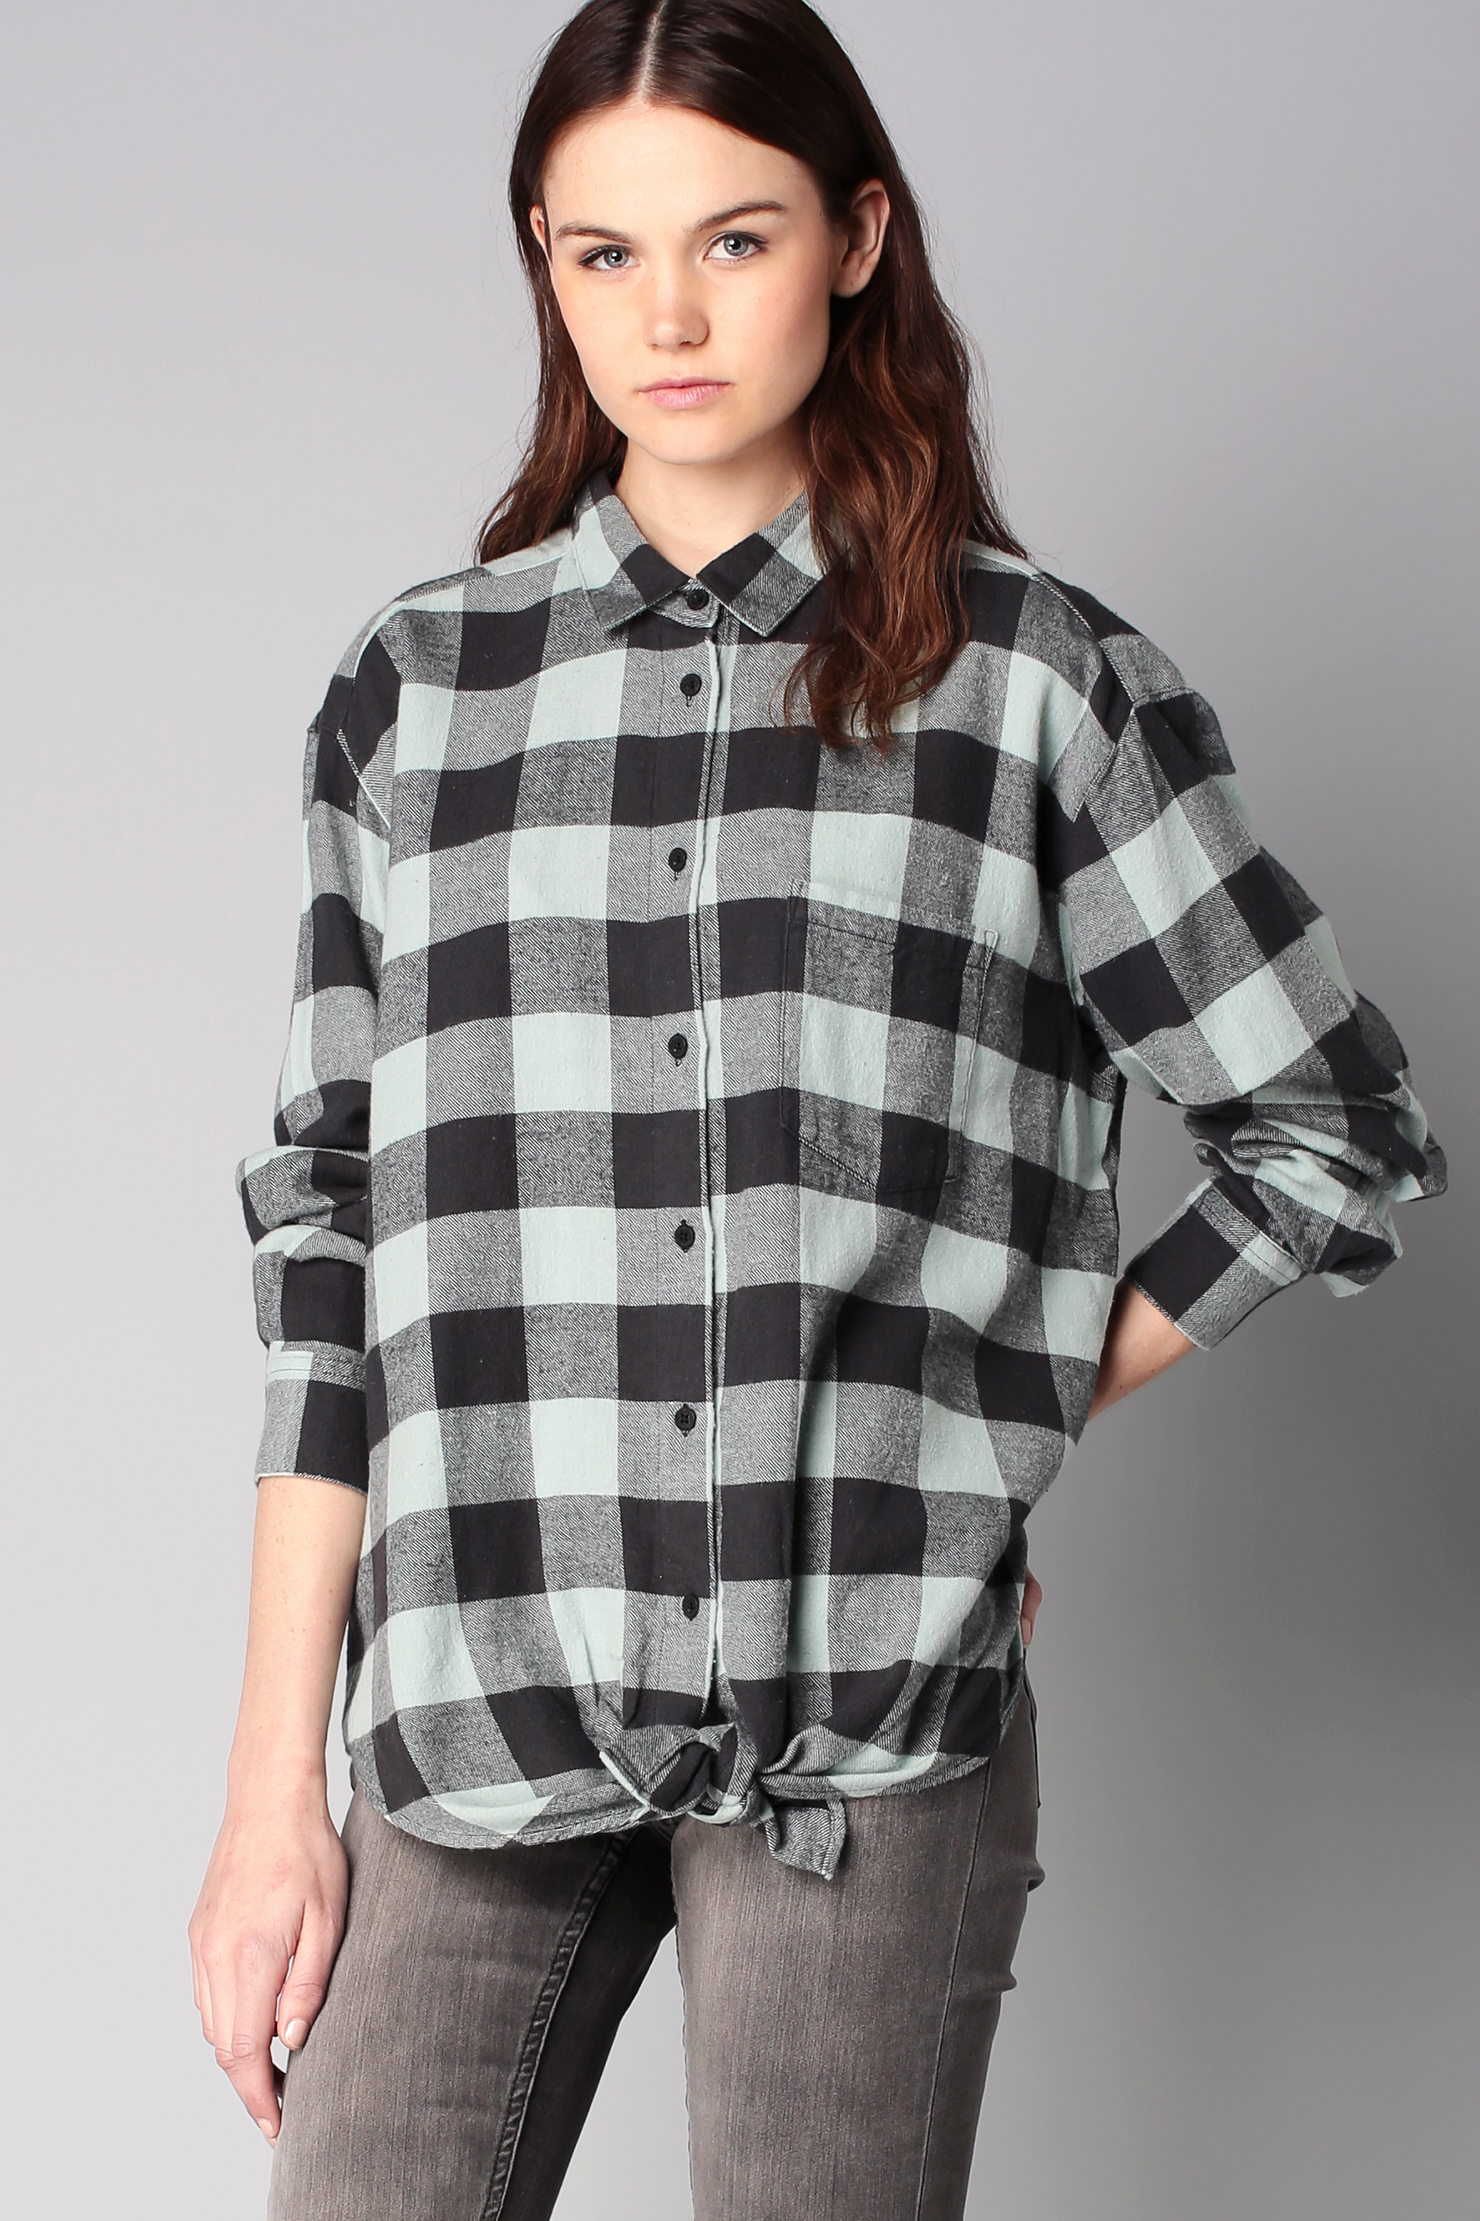 Cheap blouse shirt blue denim blouses for Cheap custom t shirts no minimum order